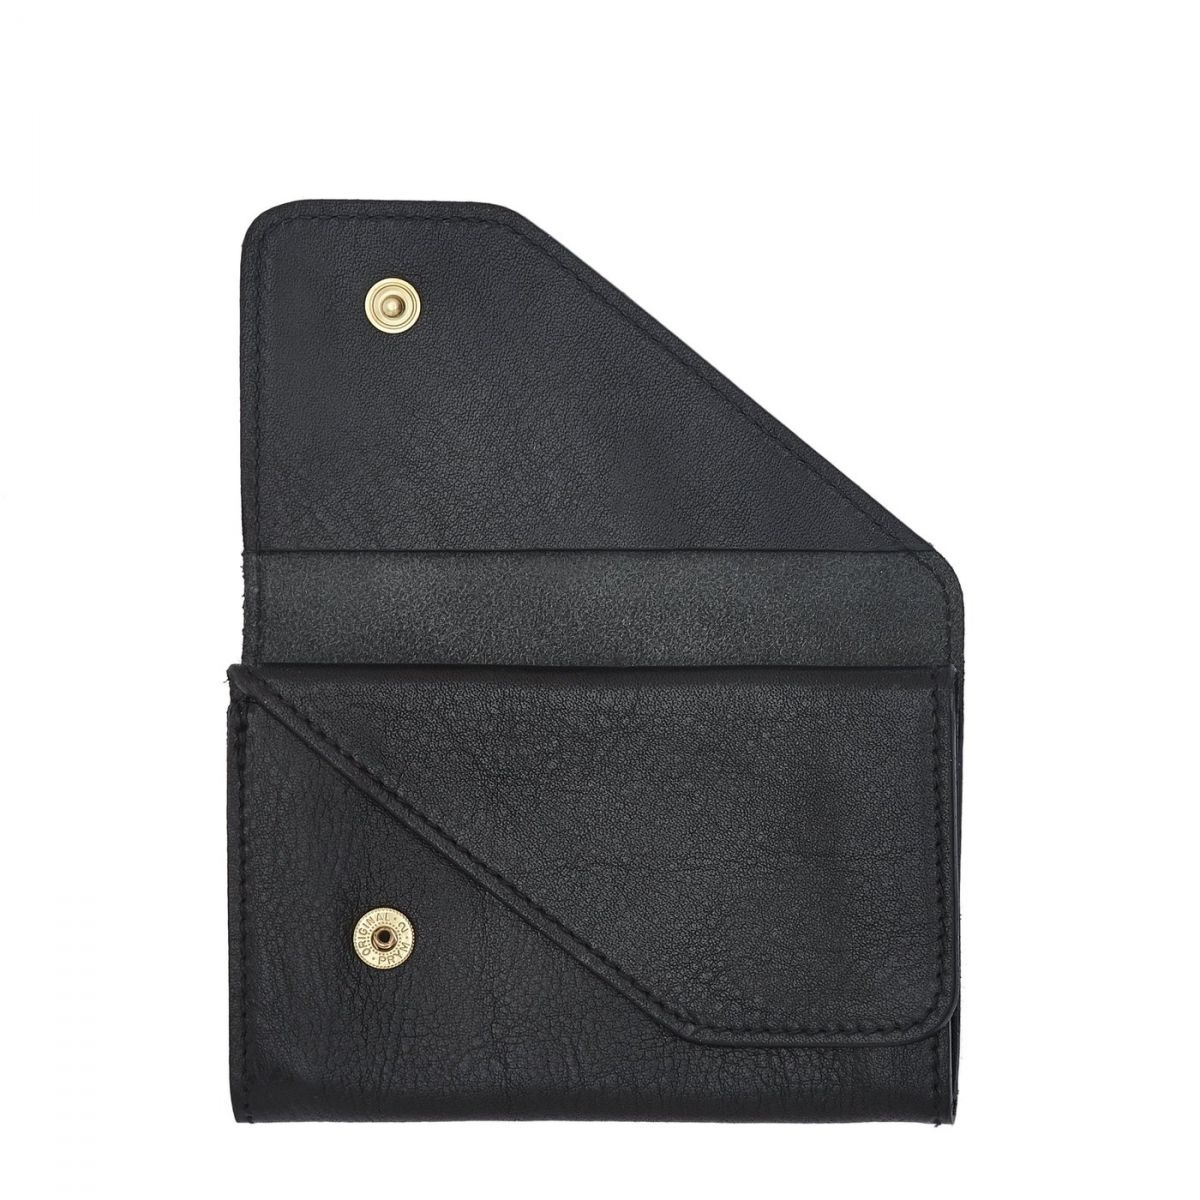 Card Case  in Cowhide Double Leather SCC015 color Black | Details